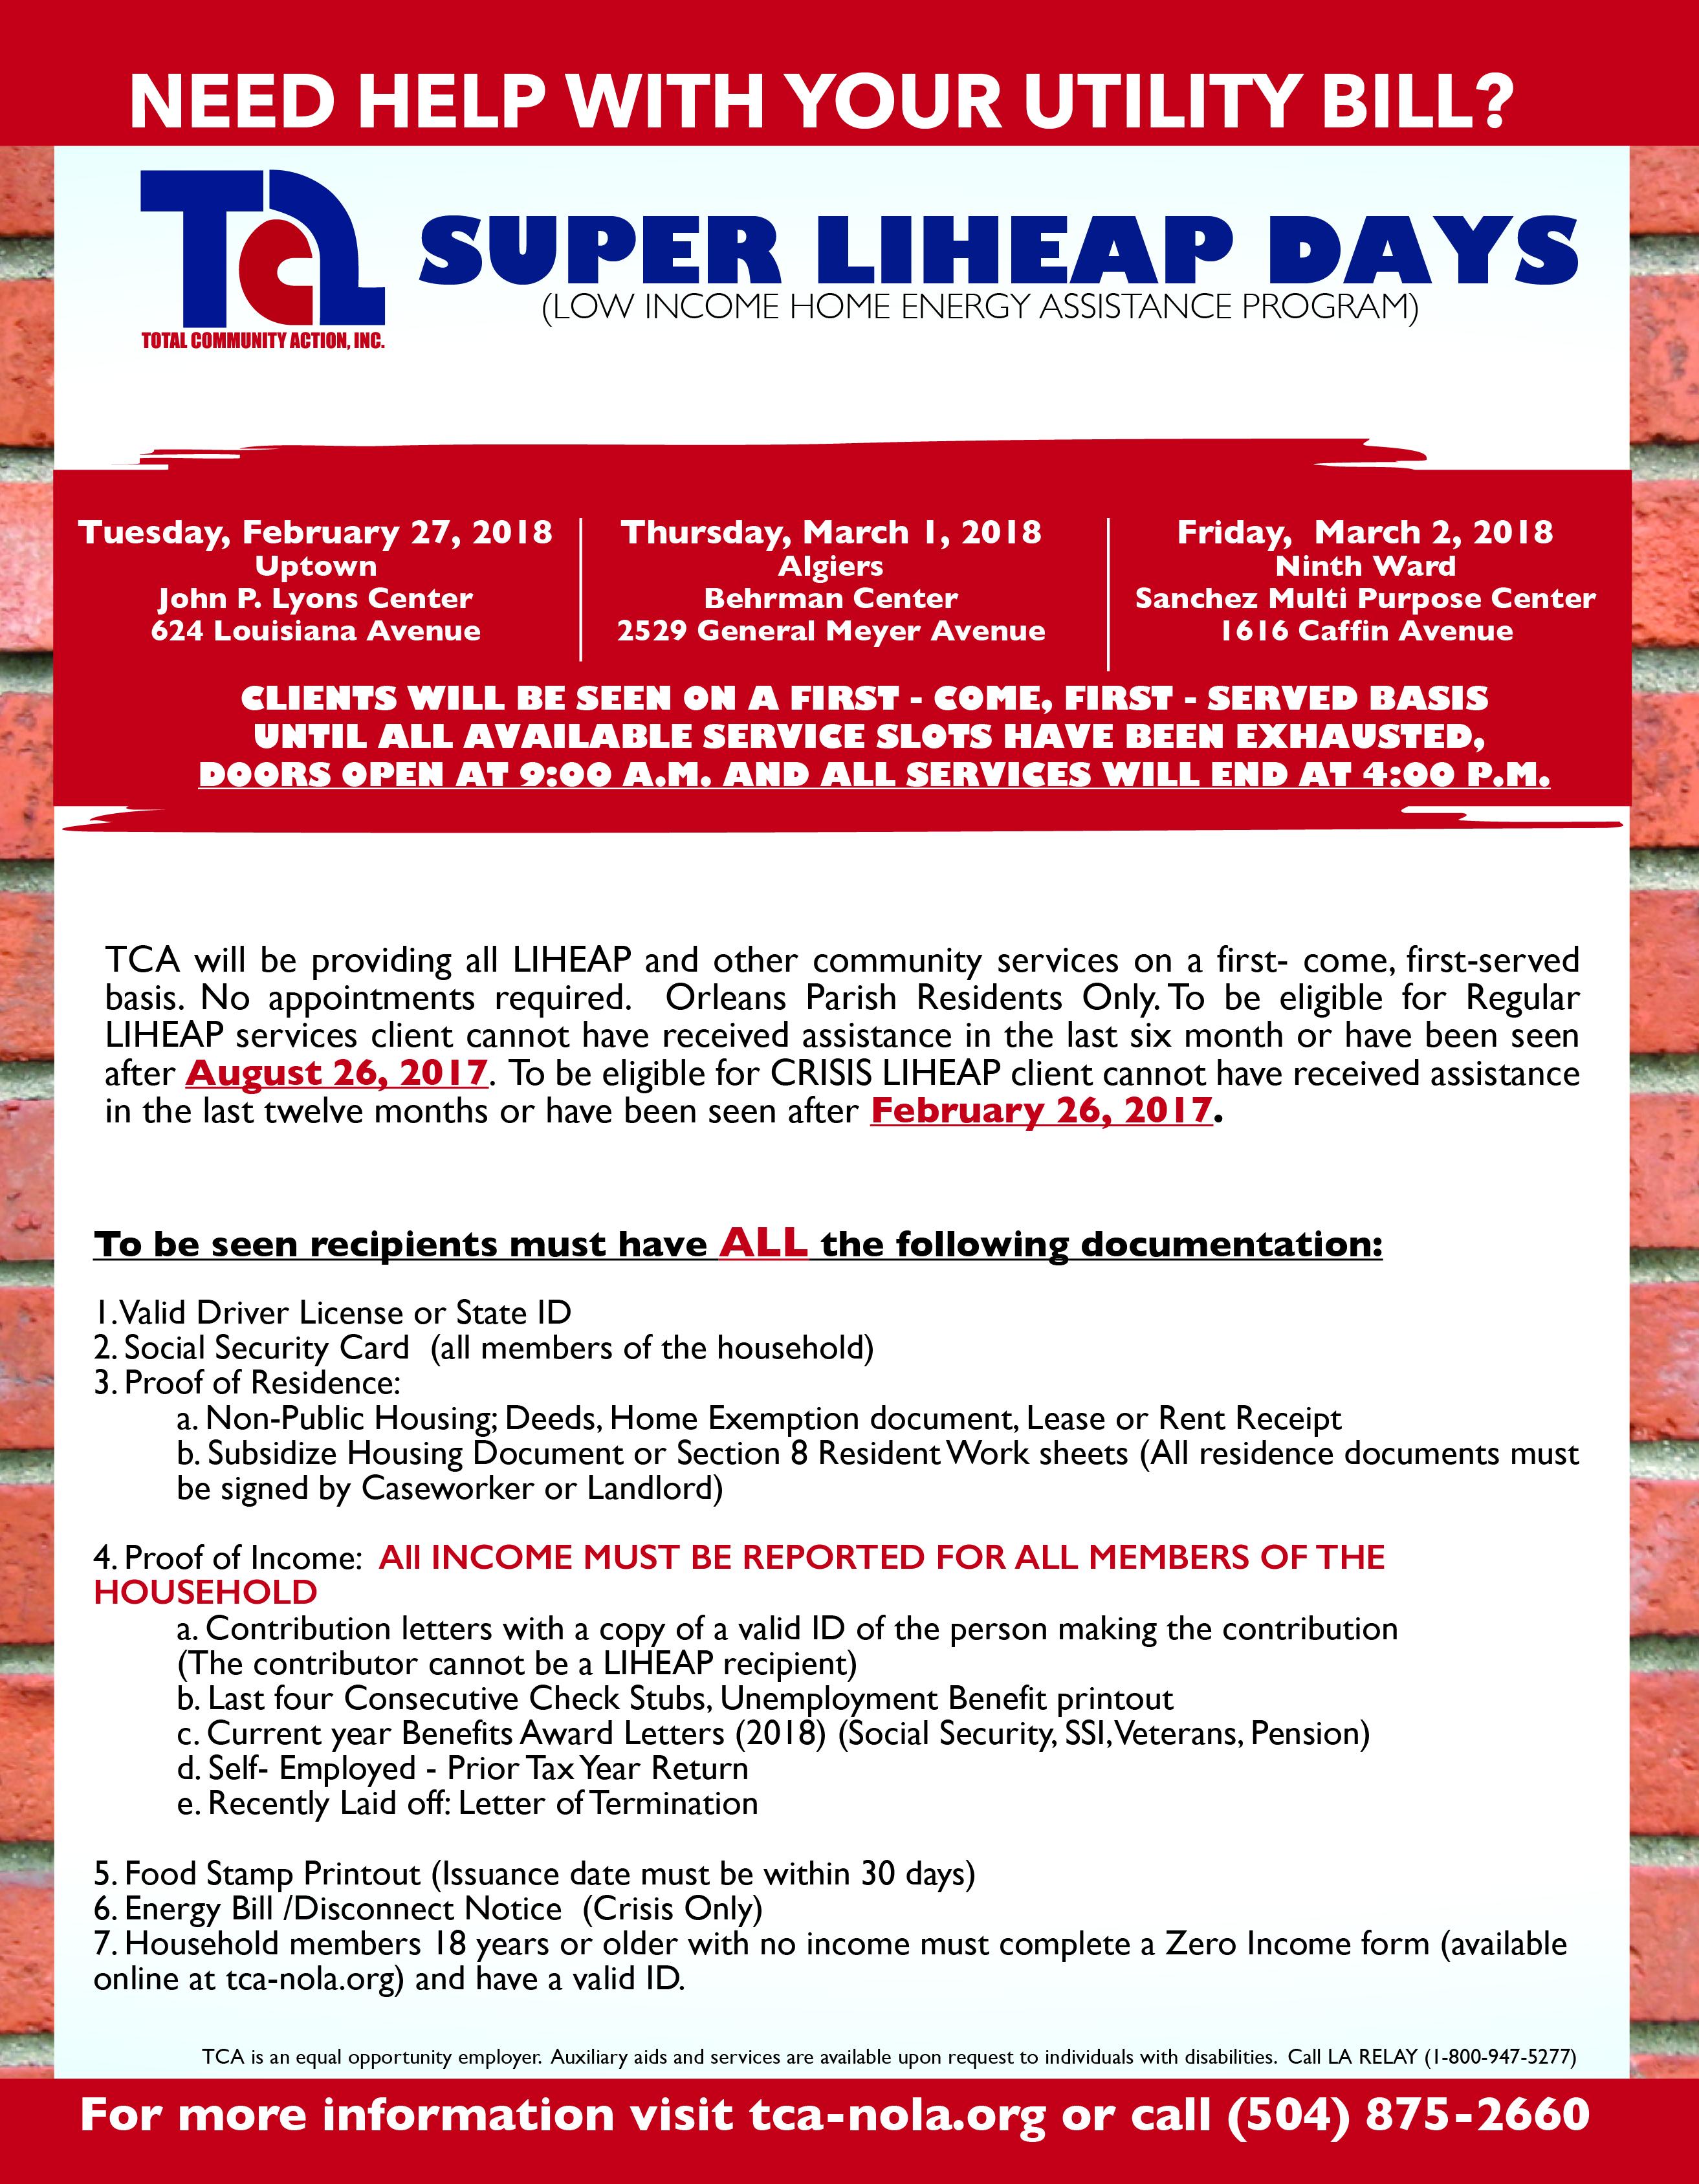 2018 Super LiHEAP Days (Rescheduled Dates) | Total Community